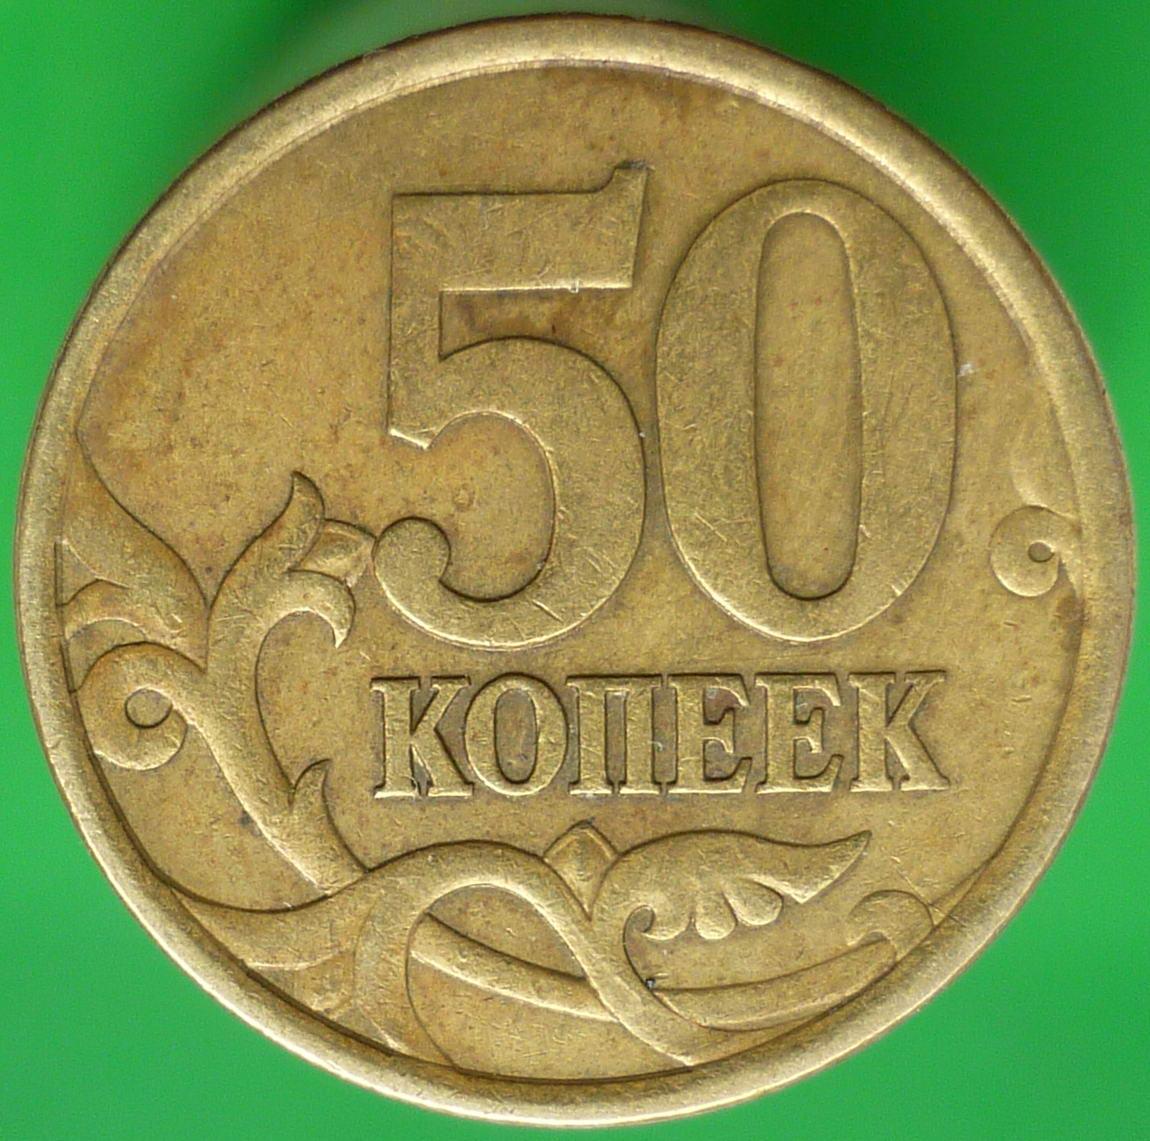 50 копеек фото 2003